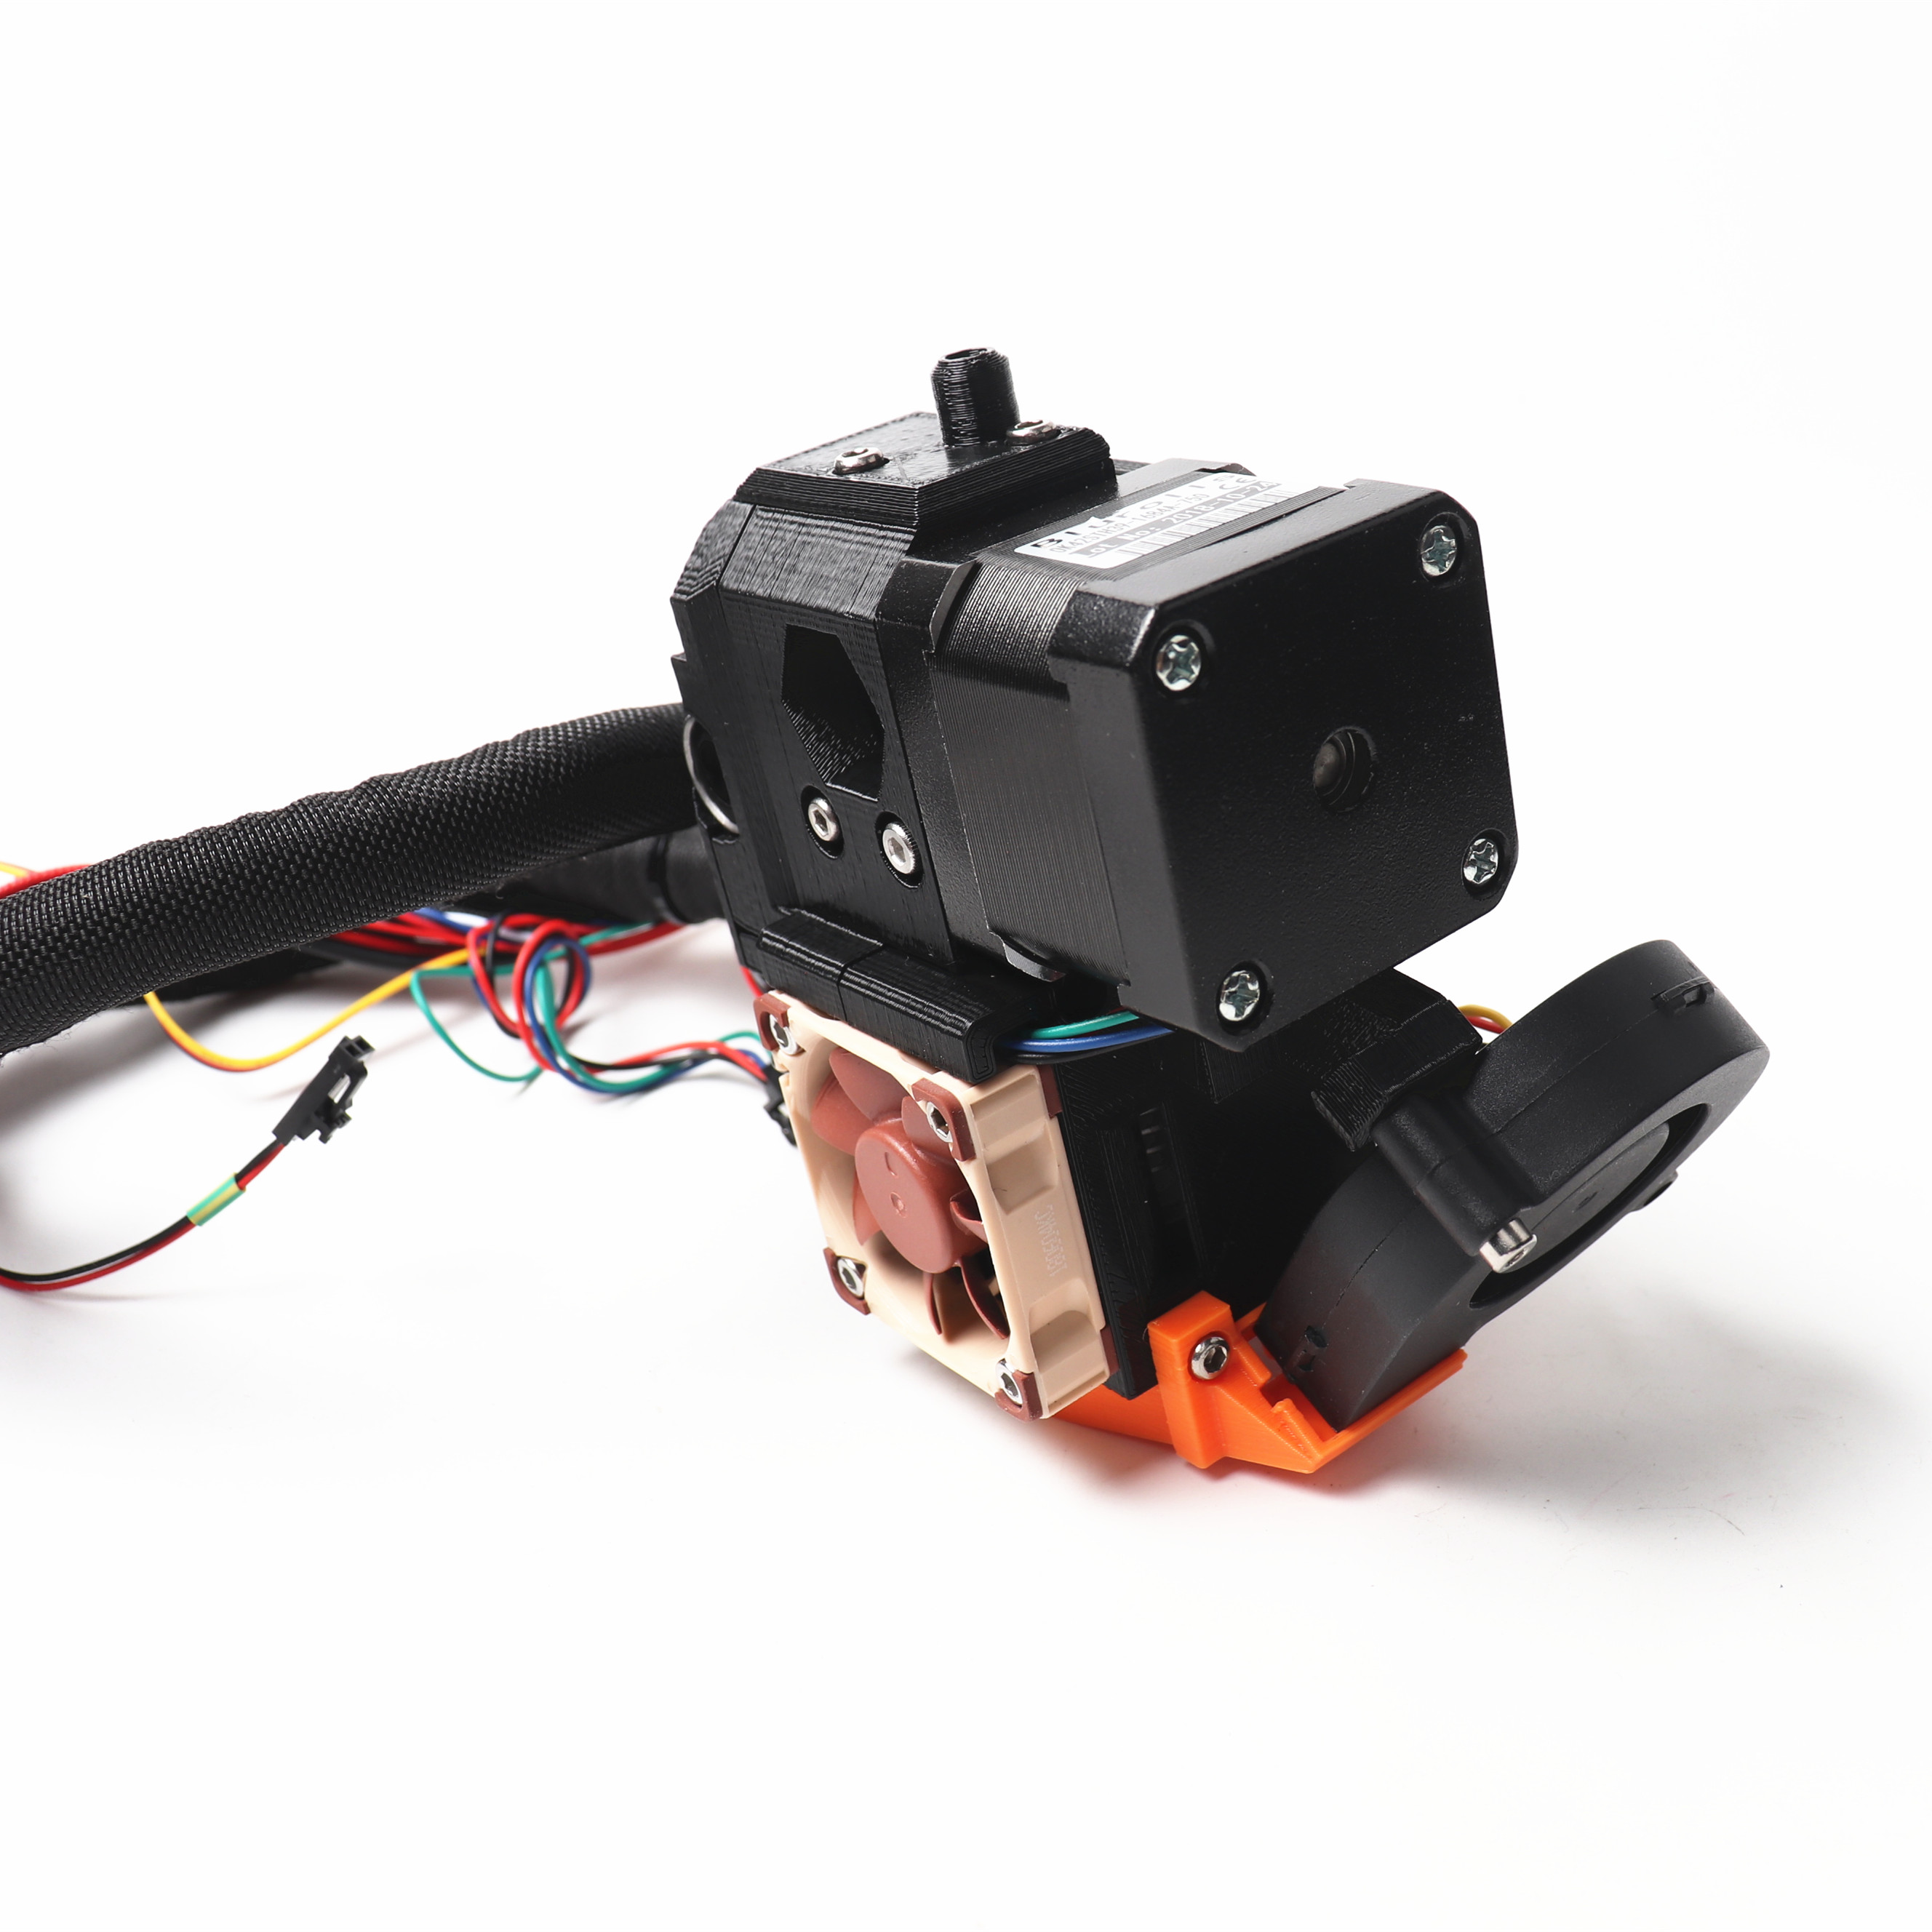 Prusa I3 MK3 Hotend Extruder Full Kit, Noctua Fan, Pinda V2, Filament Sensor,textile(not Assembled)